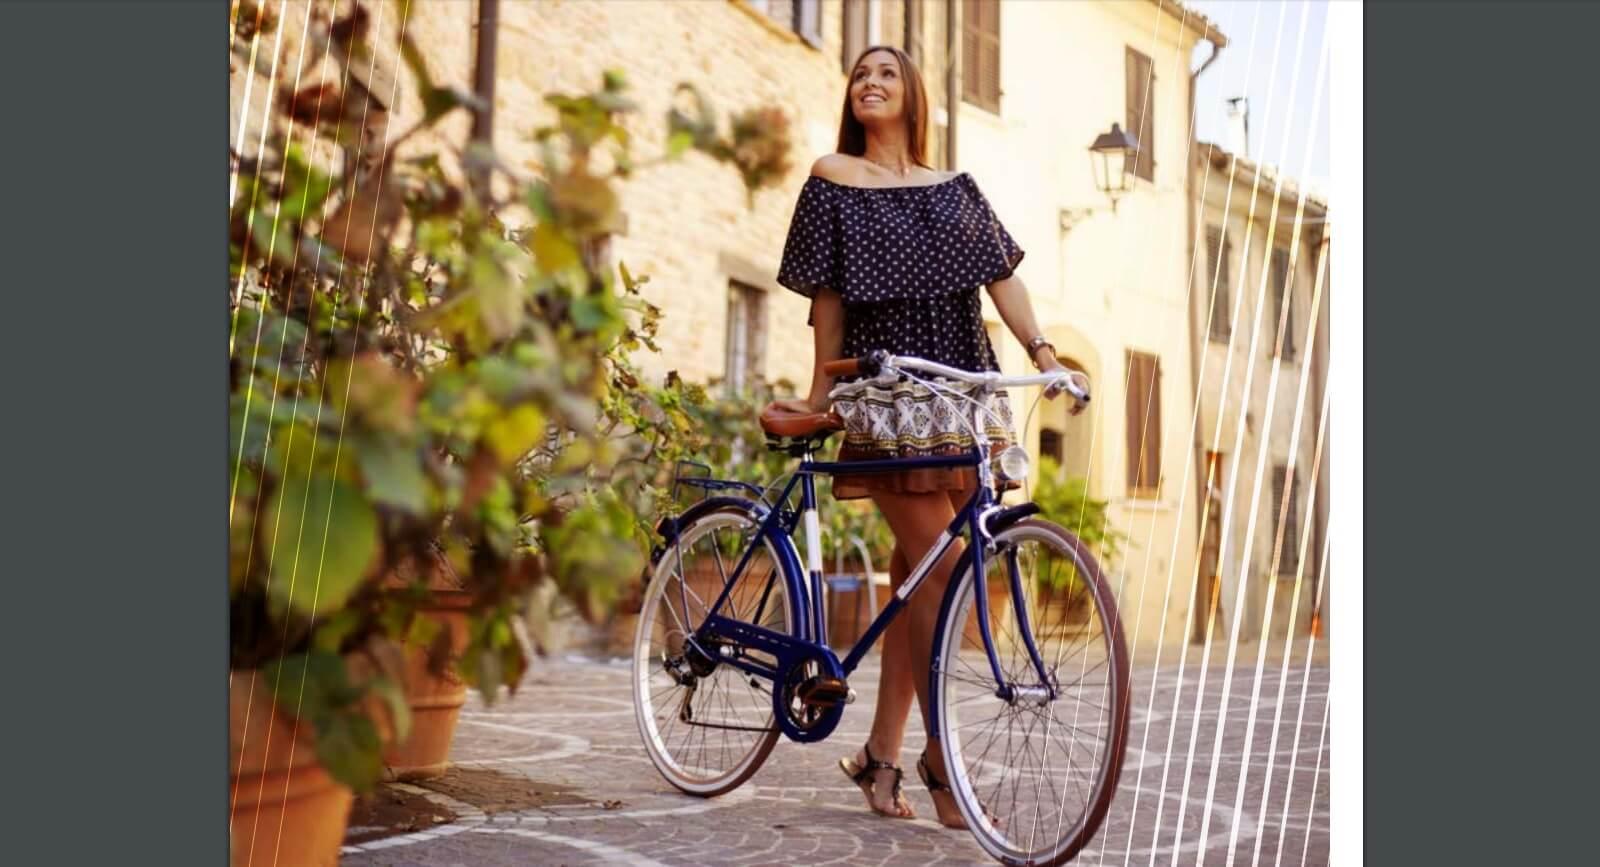 trafic urban citybike lady